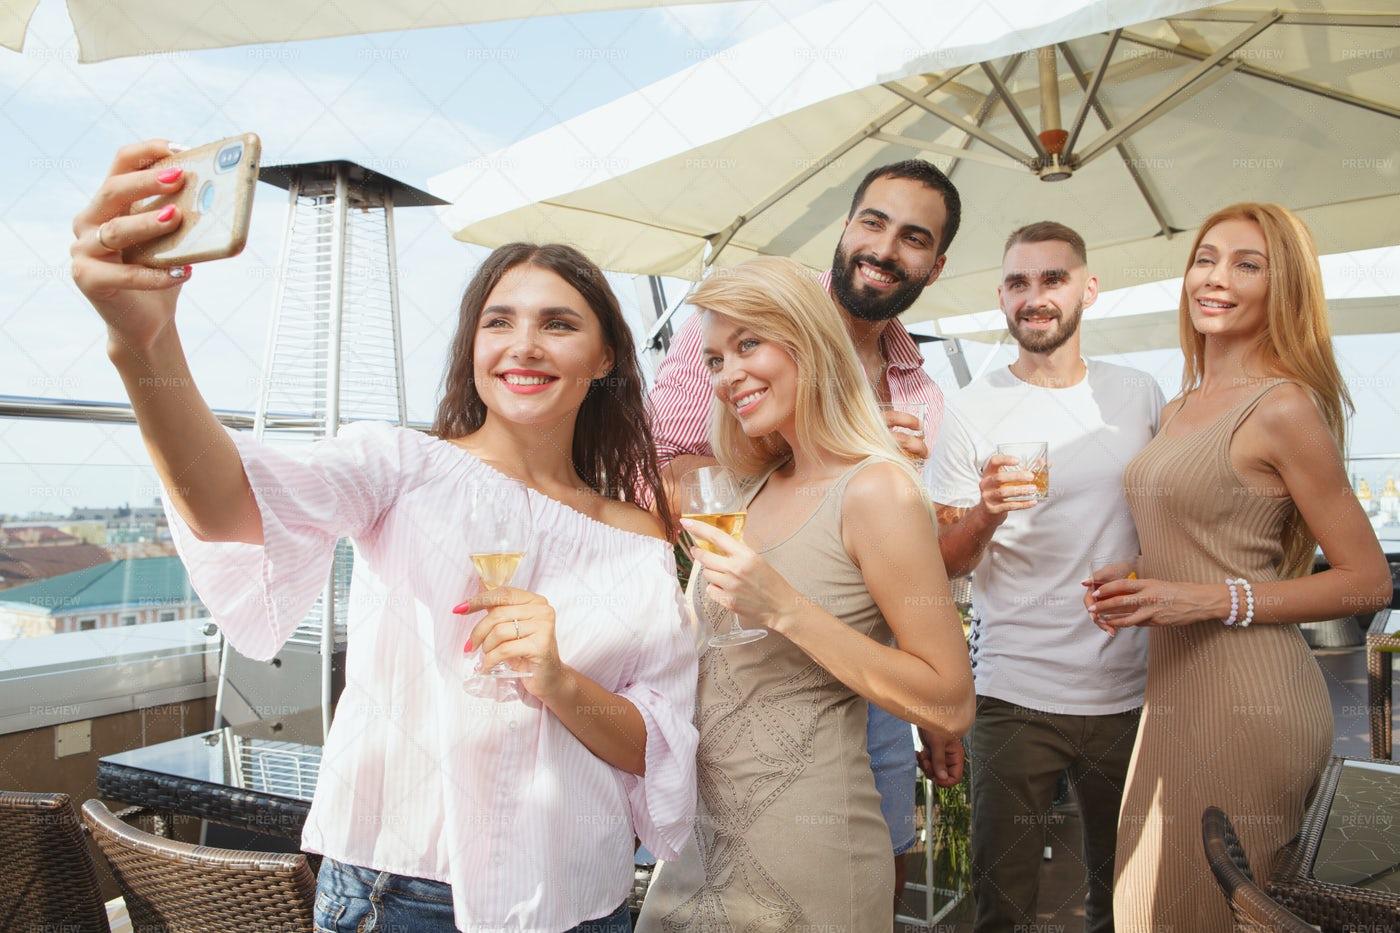 Rooftop Bar Selfie: Stock Photos